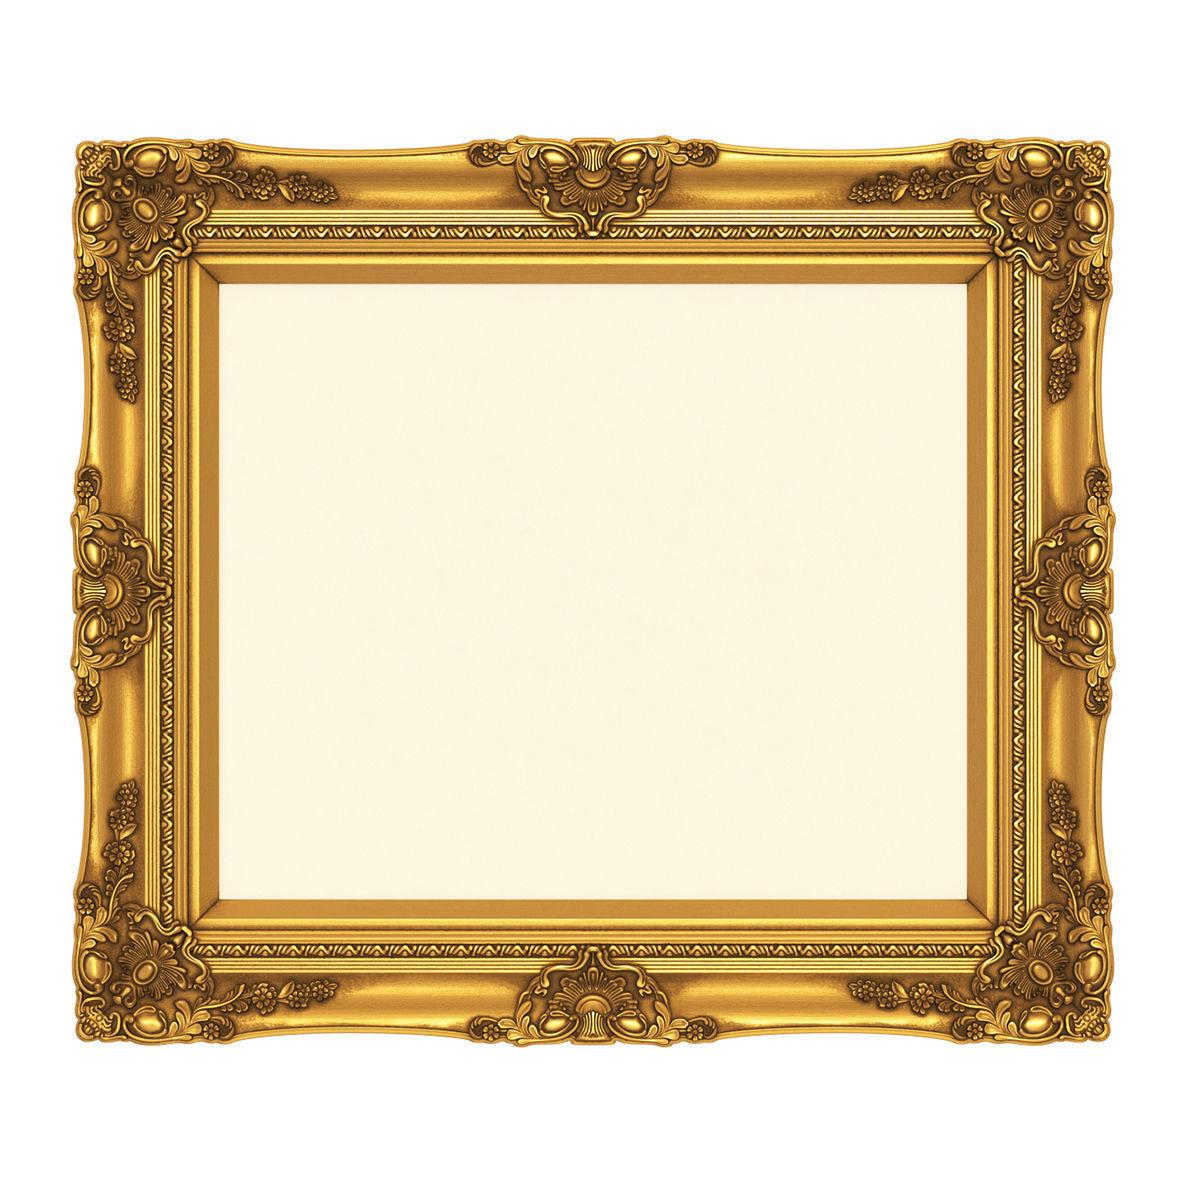 Frame picture gold v1